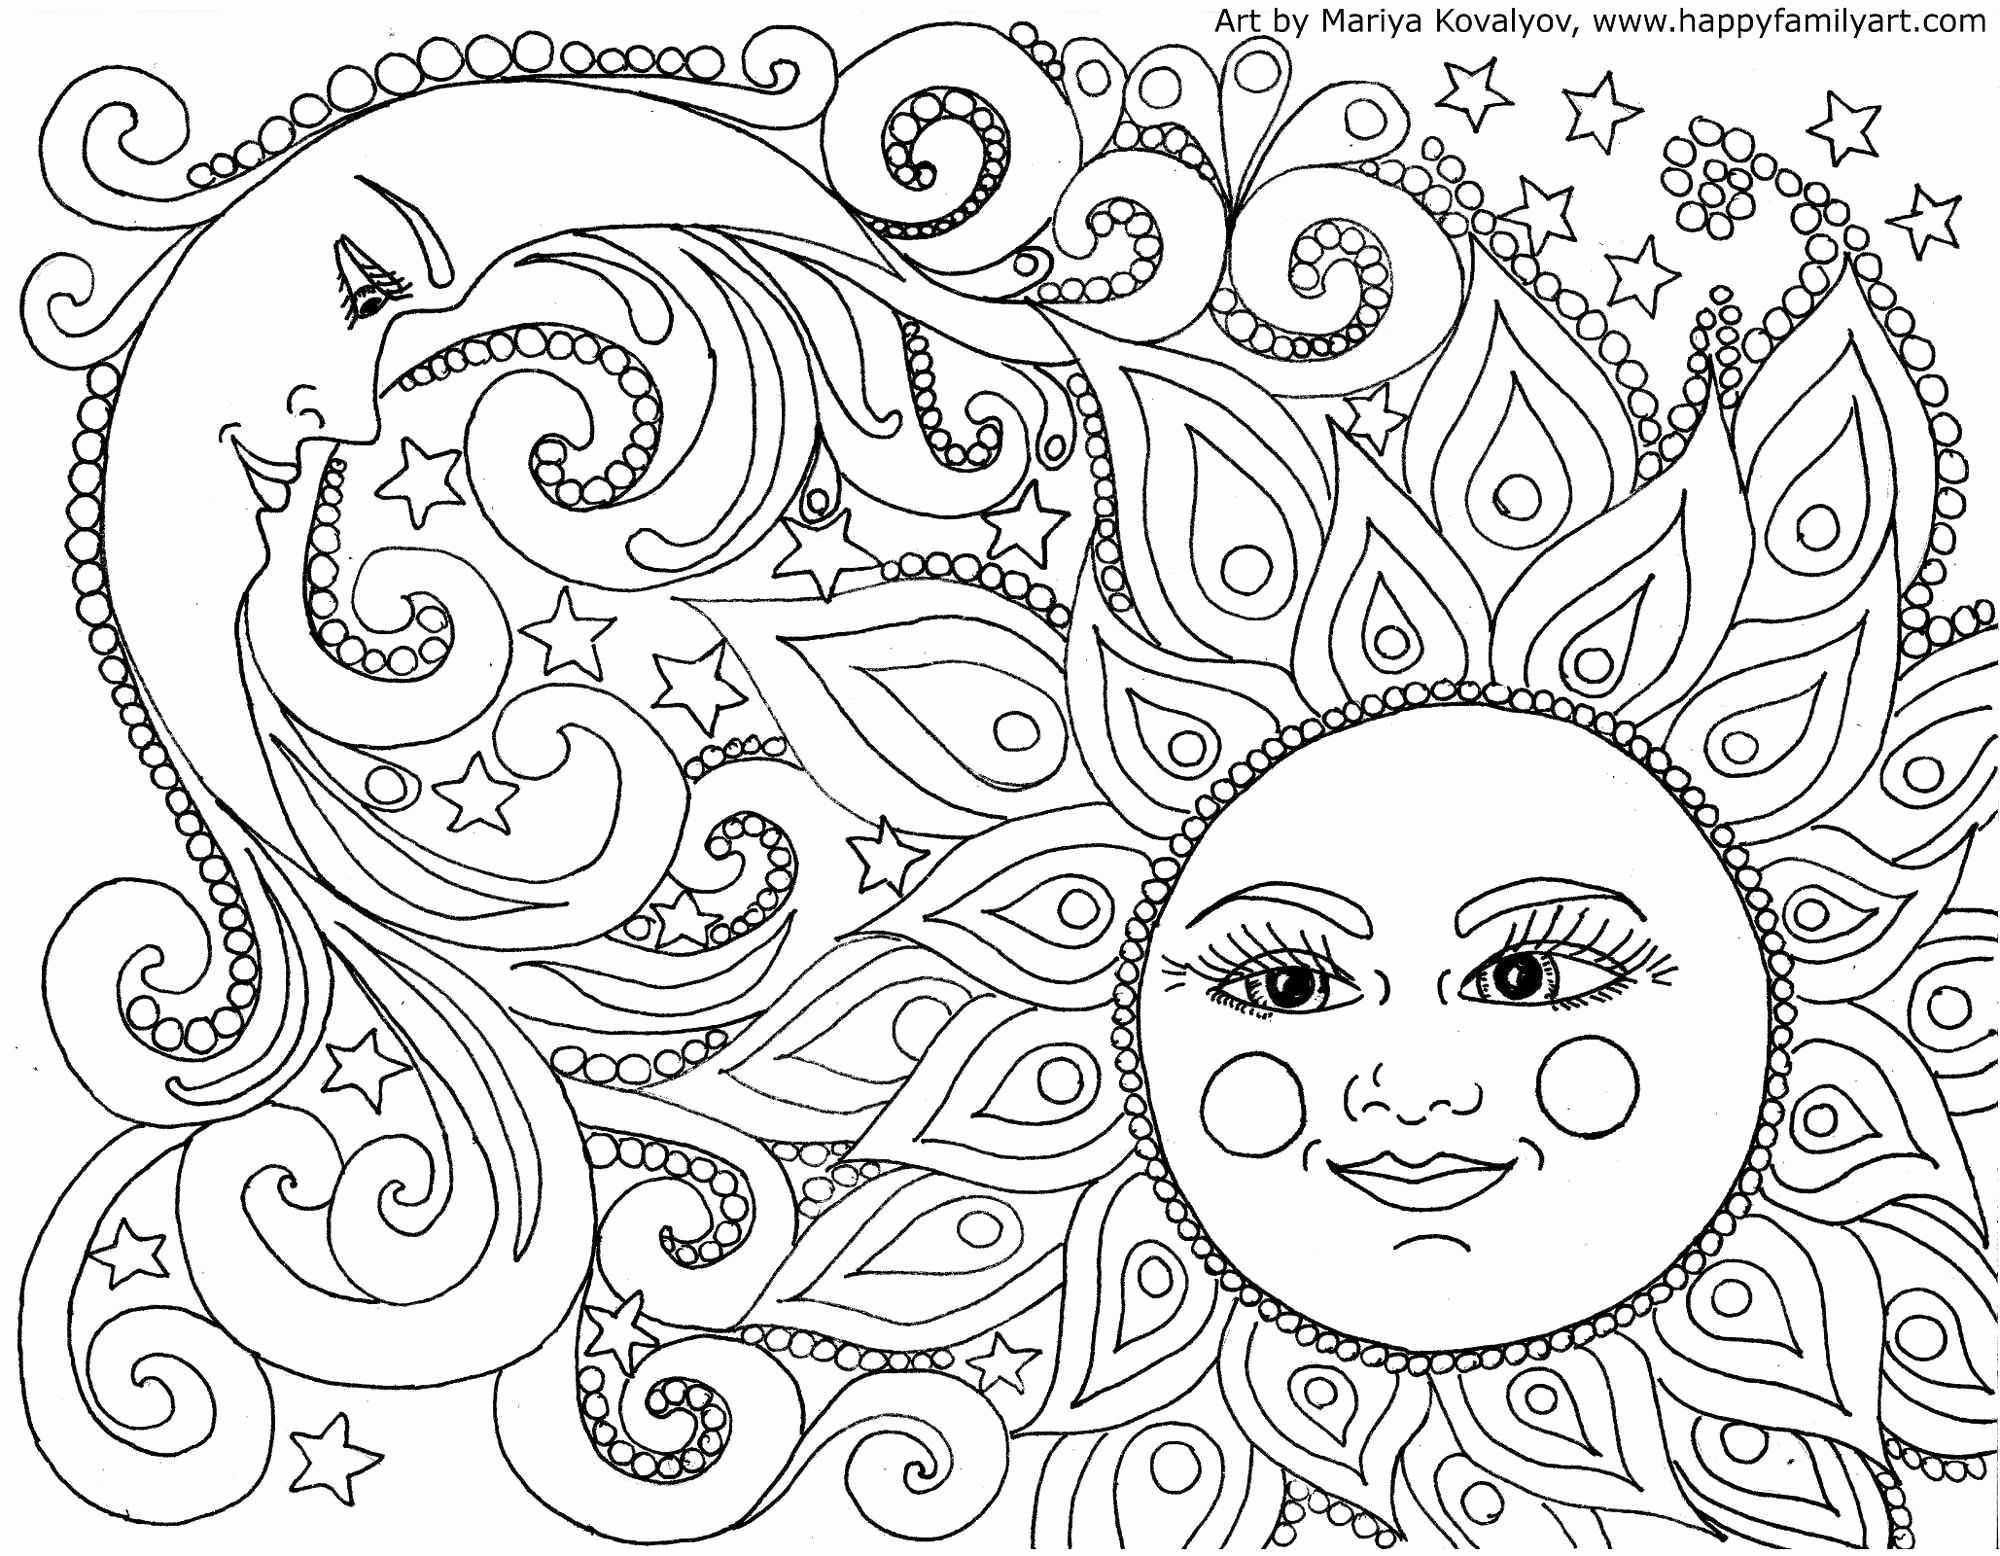 Coloring Worksheets For Kindergarten Free Best Of Coloring